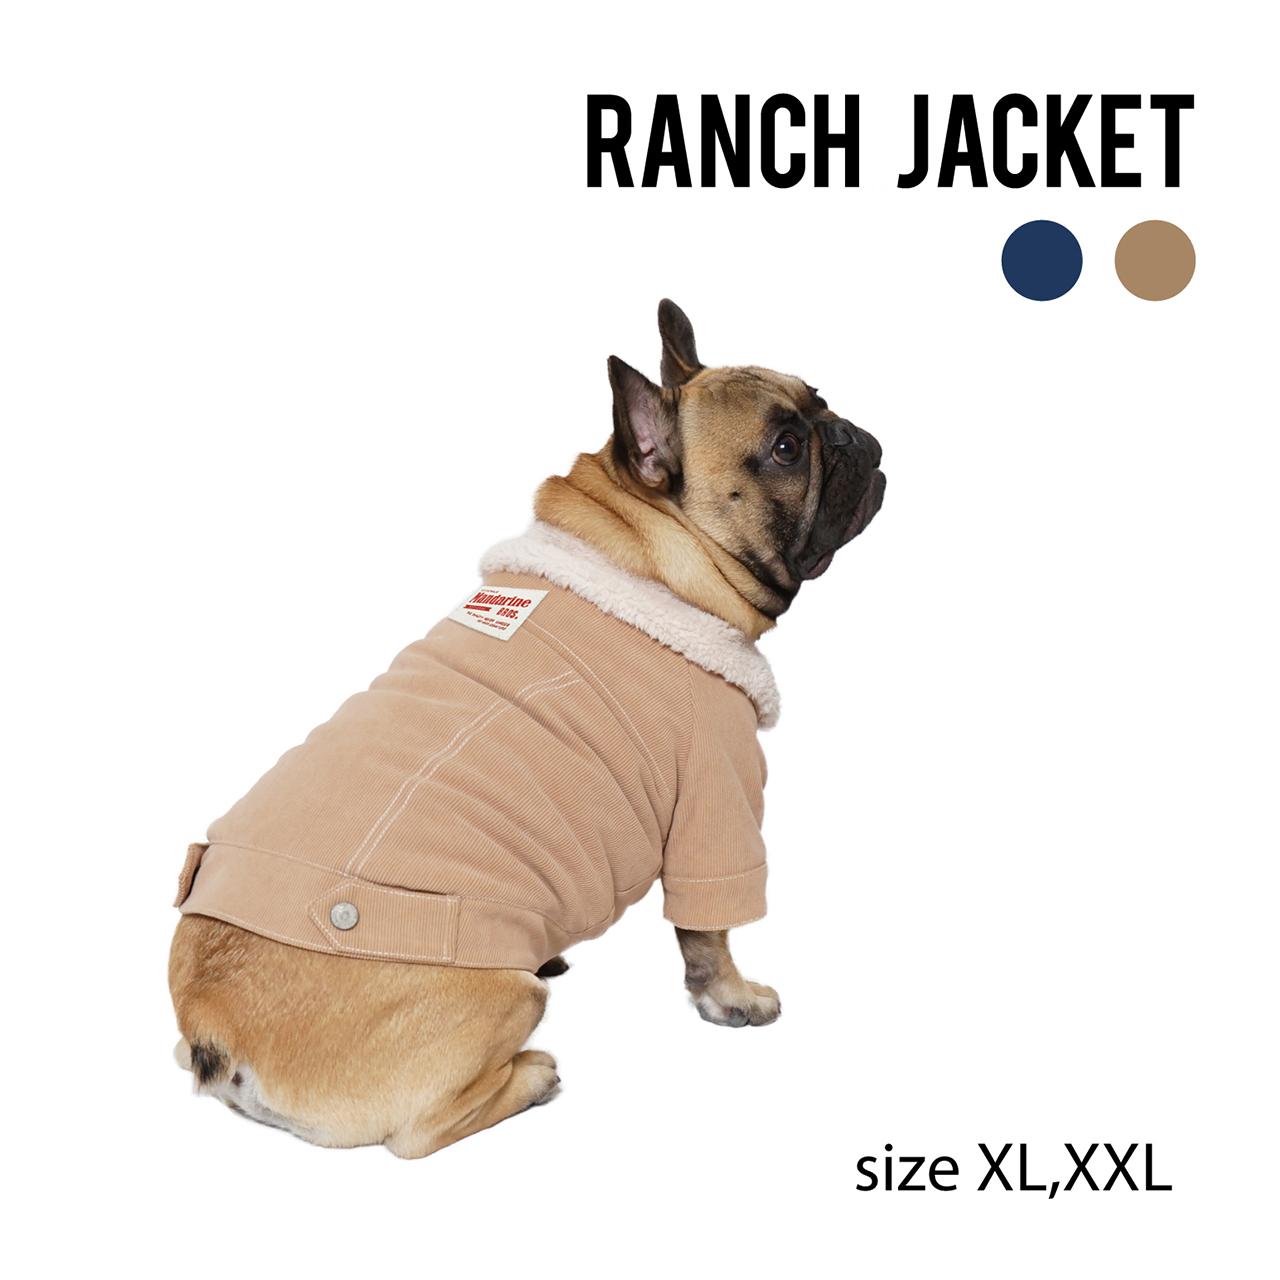 RANCH JACKET(XL・XXL) ランチジャケット